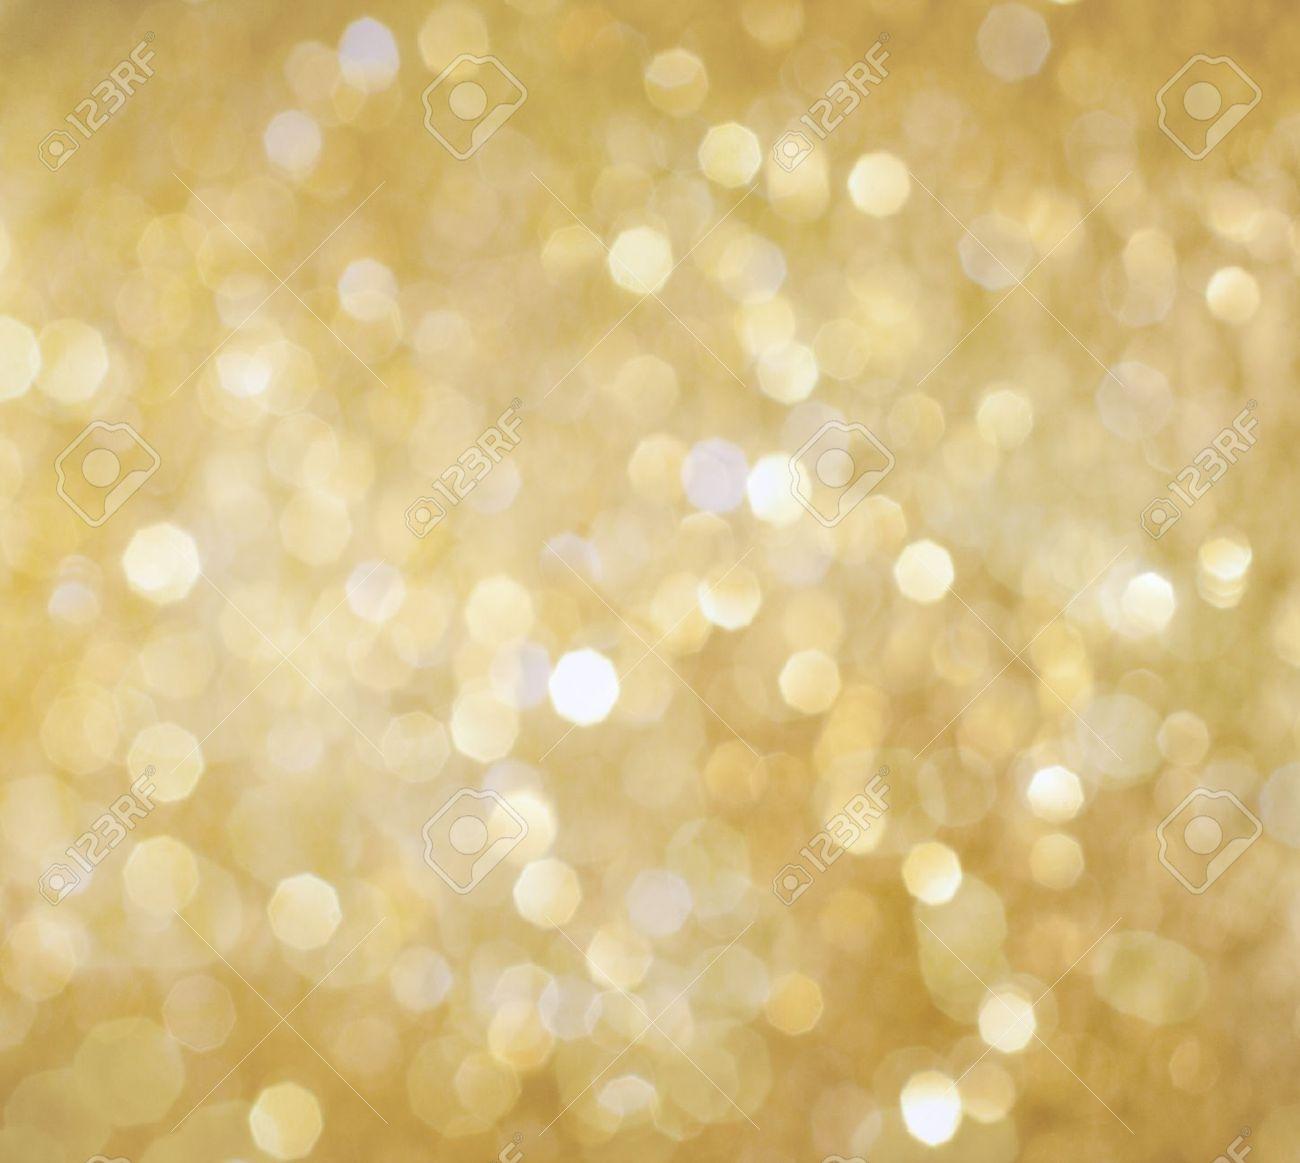 light golden background - photo #13